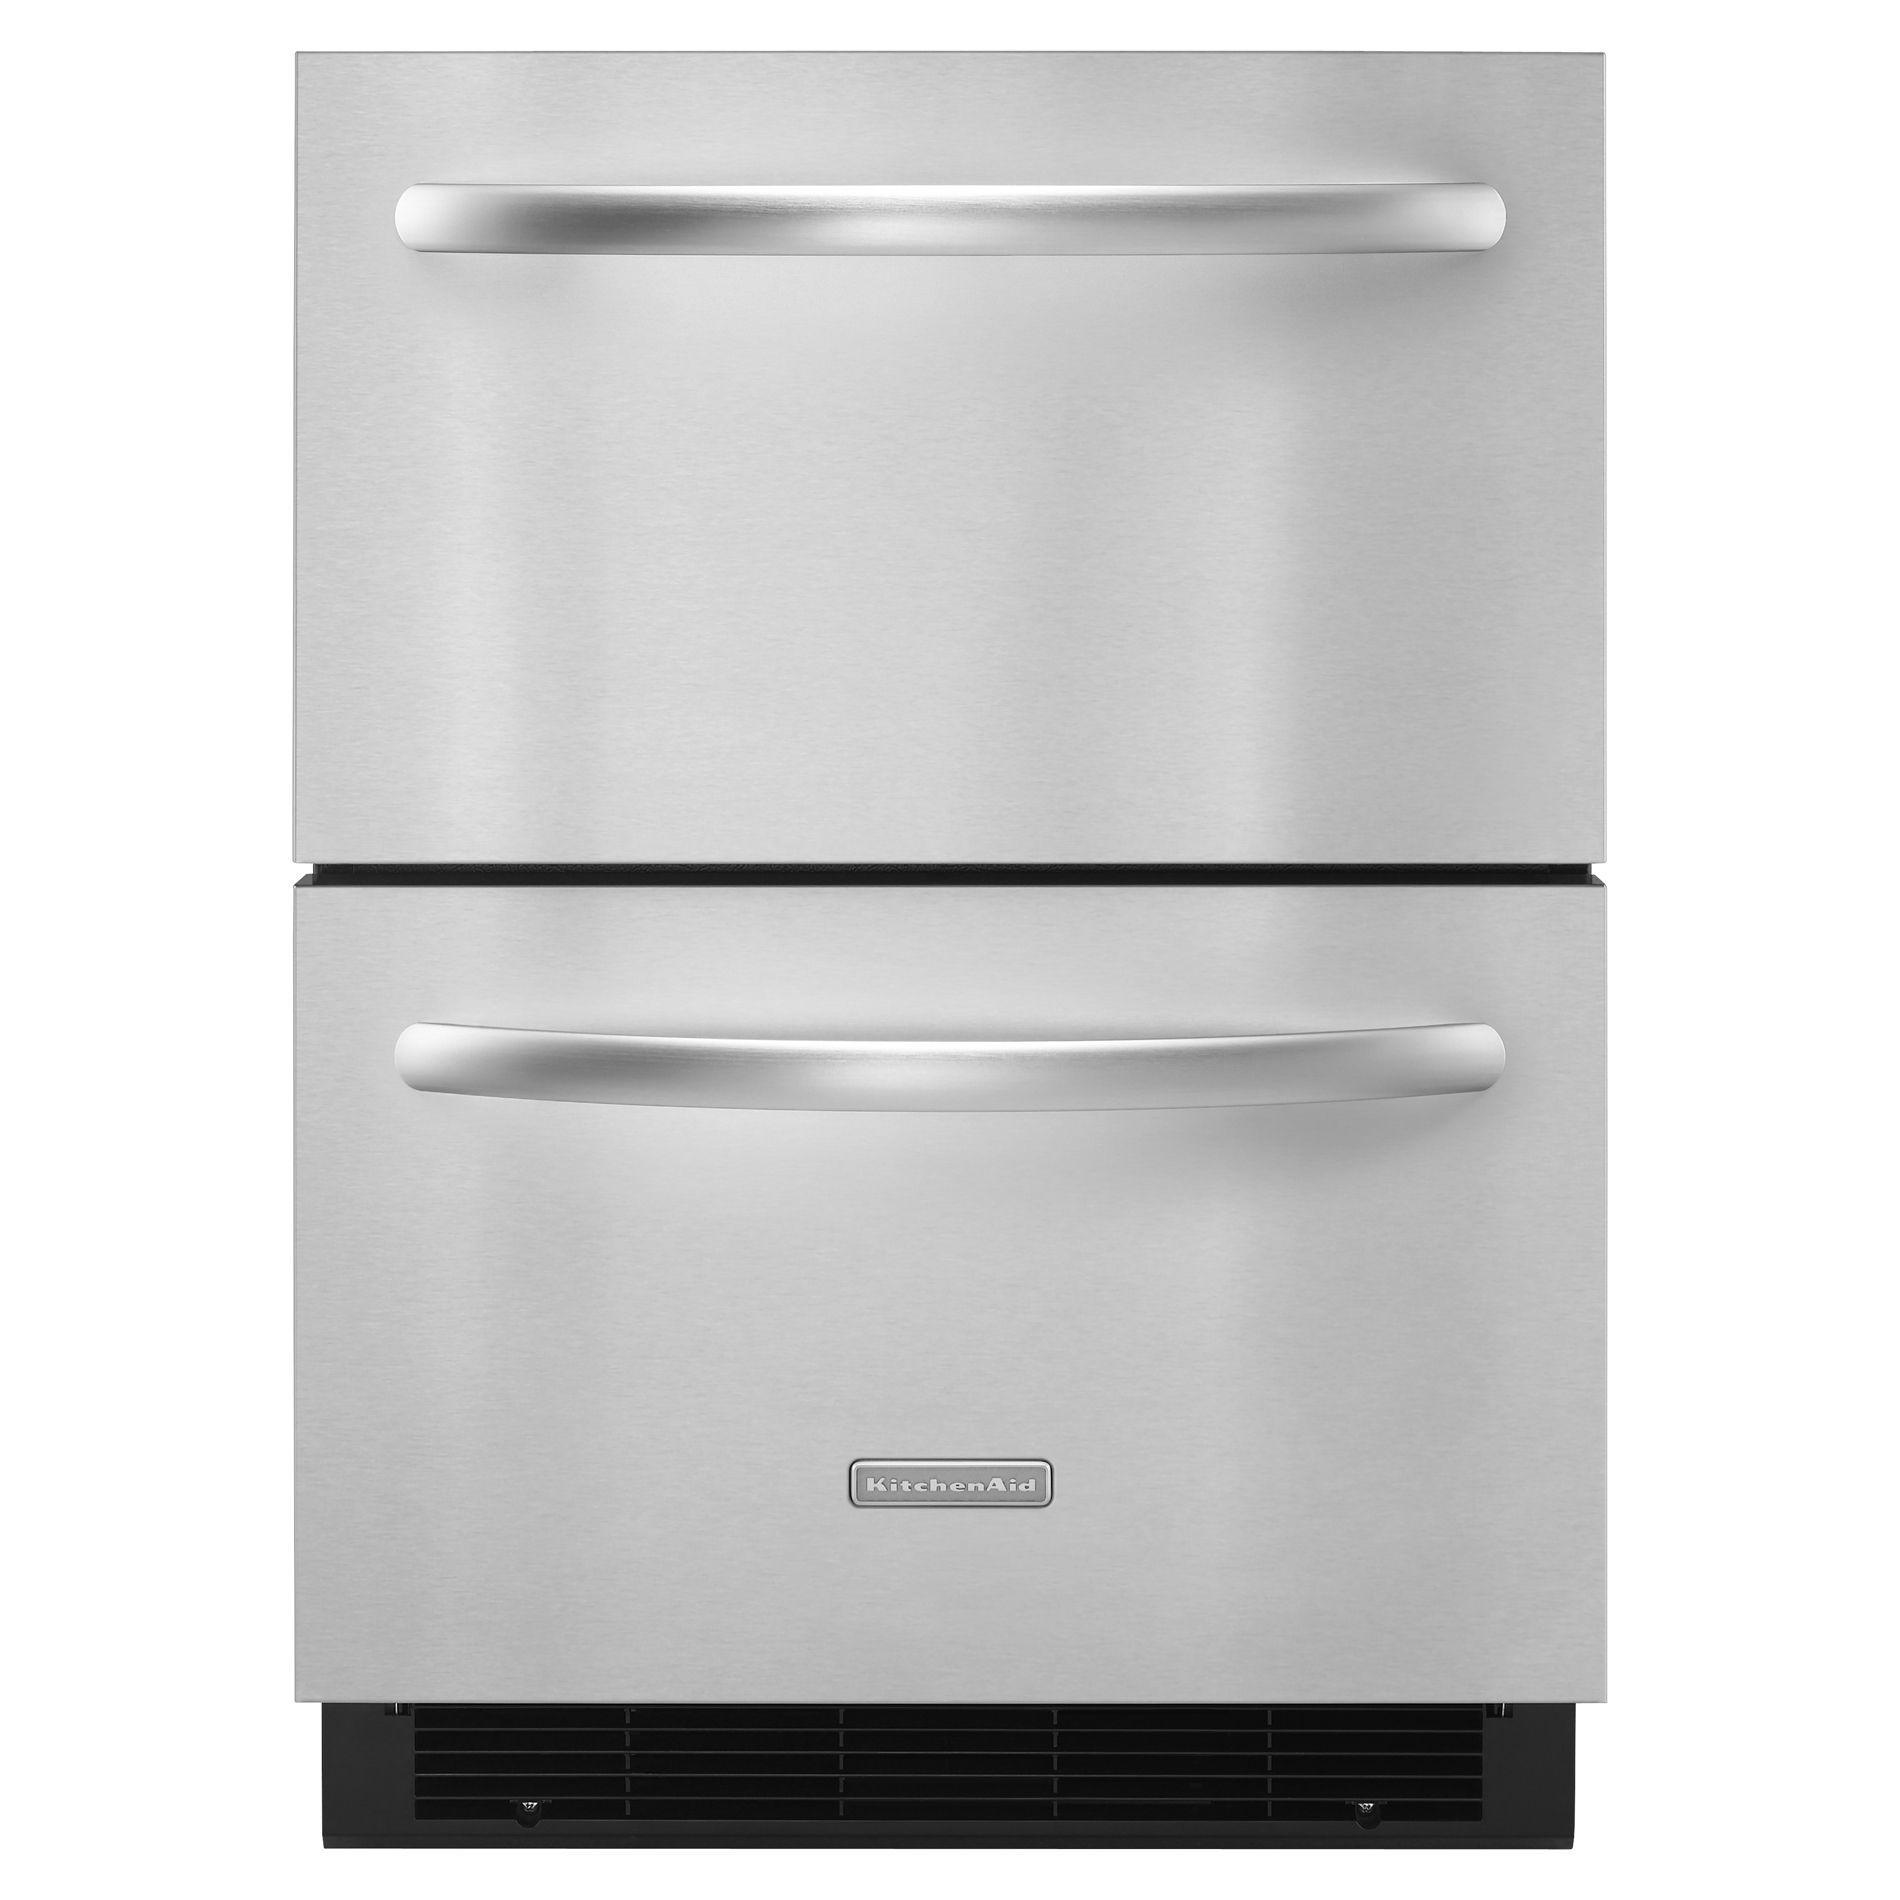 KitchenAid Compact Refrigerator 5.1 cu. ft. KDDC24RVS - Sears ...